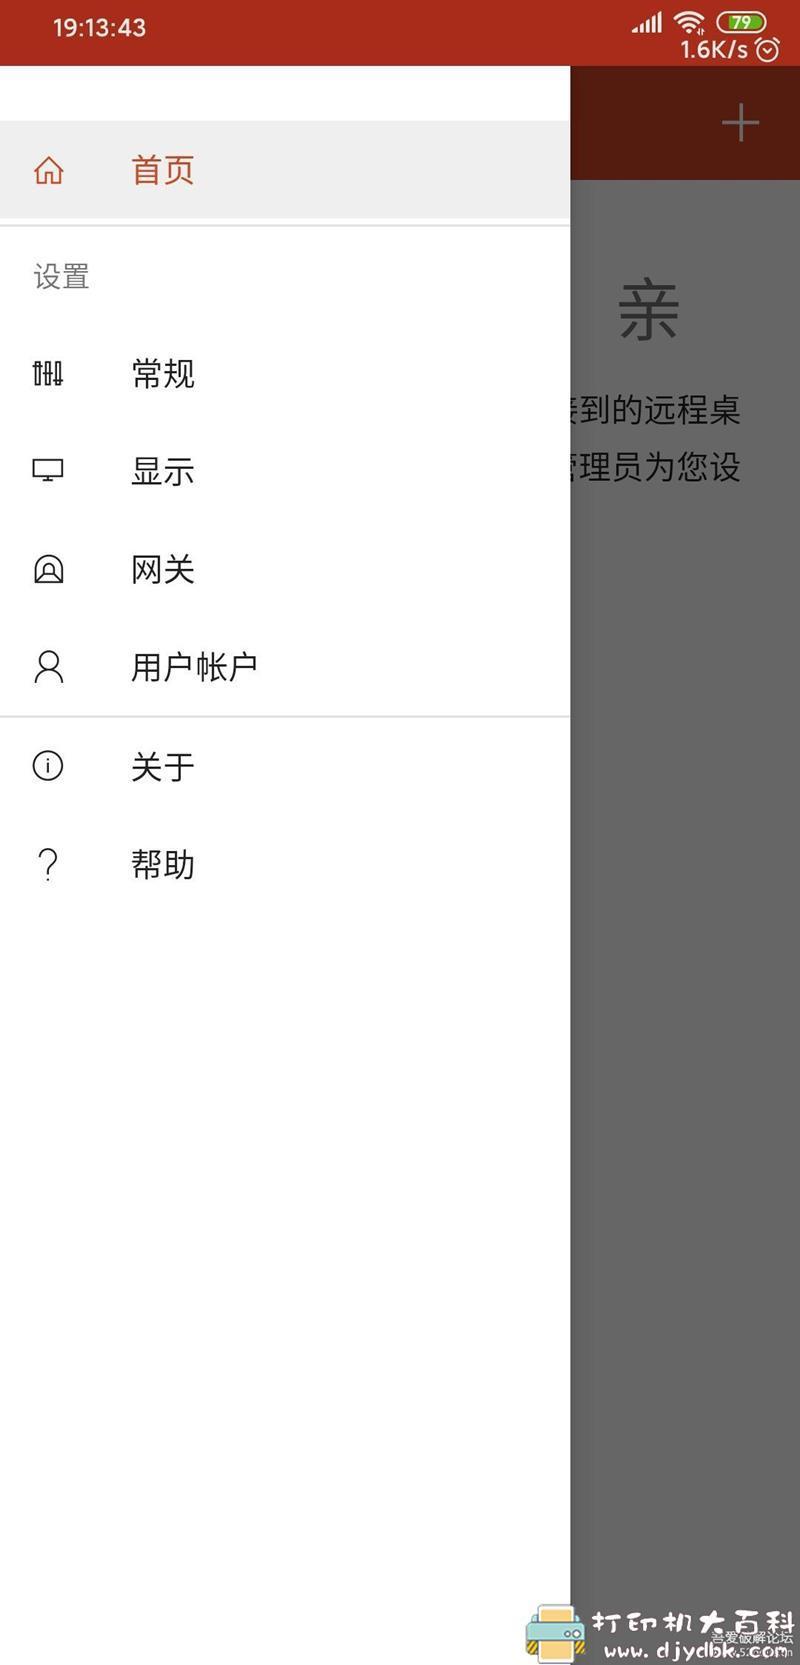 [Android]最新微软远程桌面汉化版图片 No.2